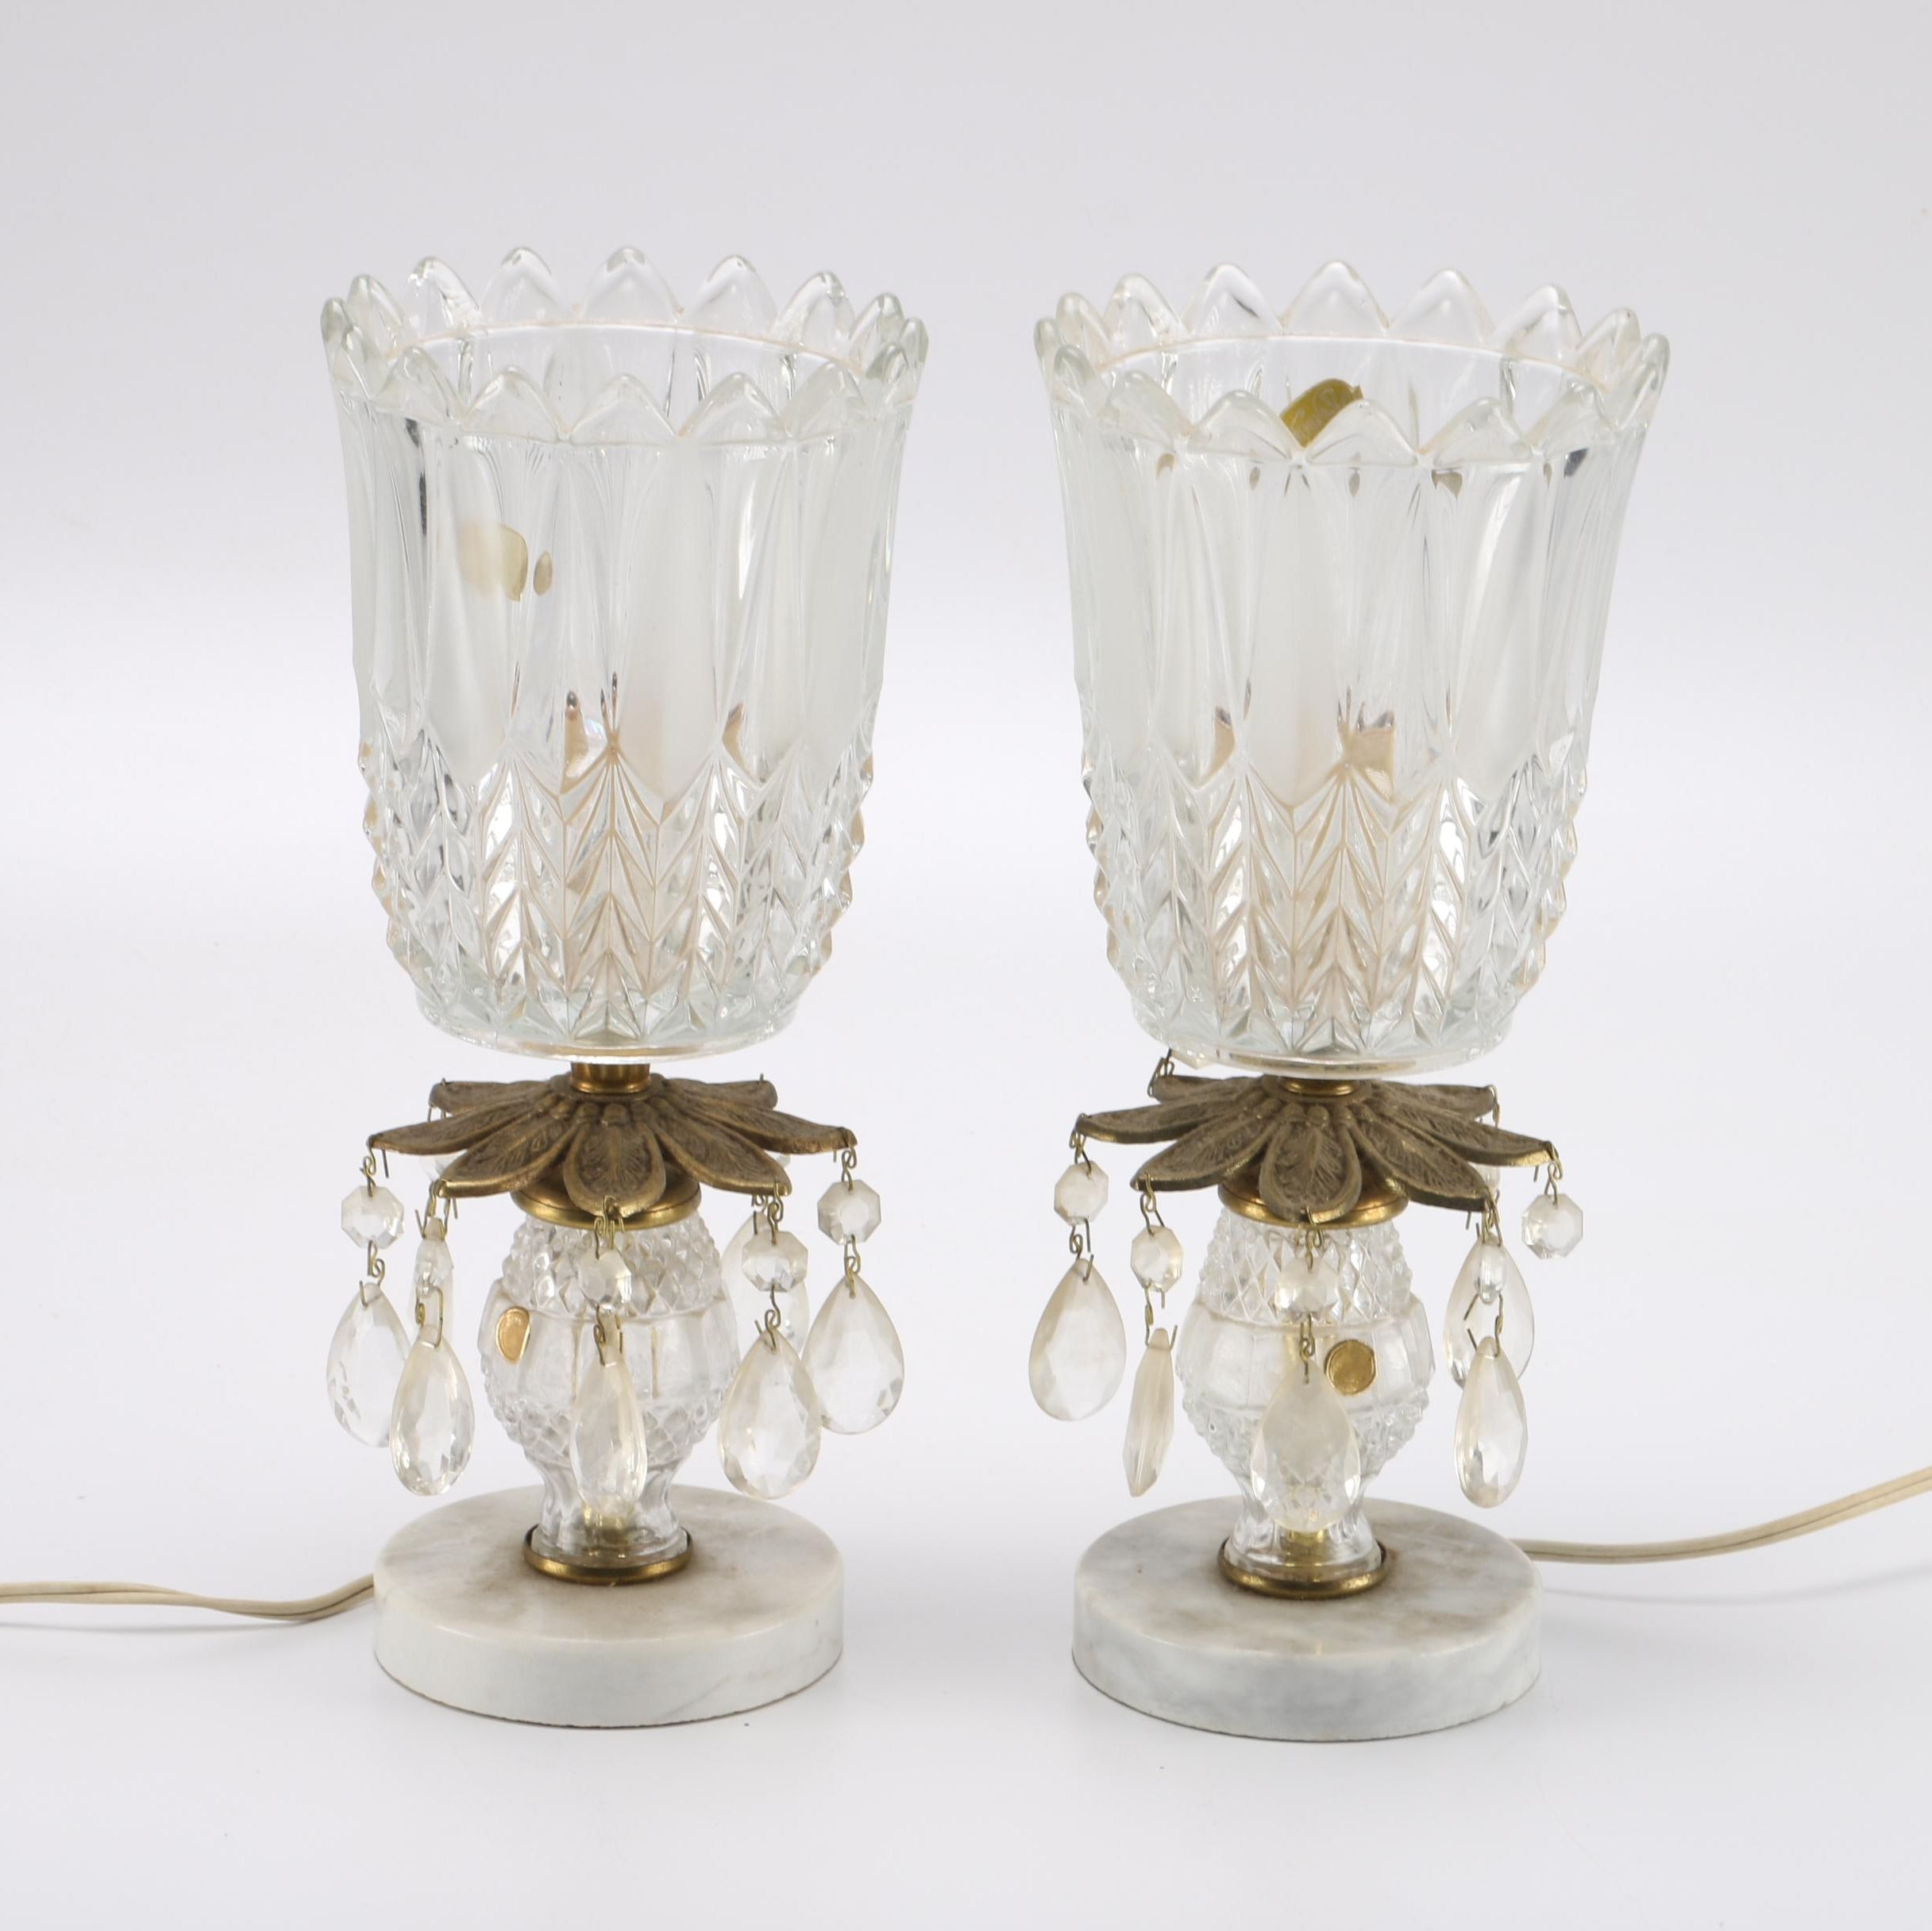 Bohemia Crystal Lamps